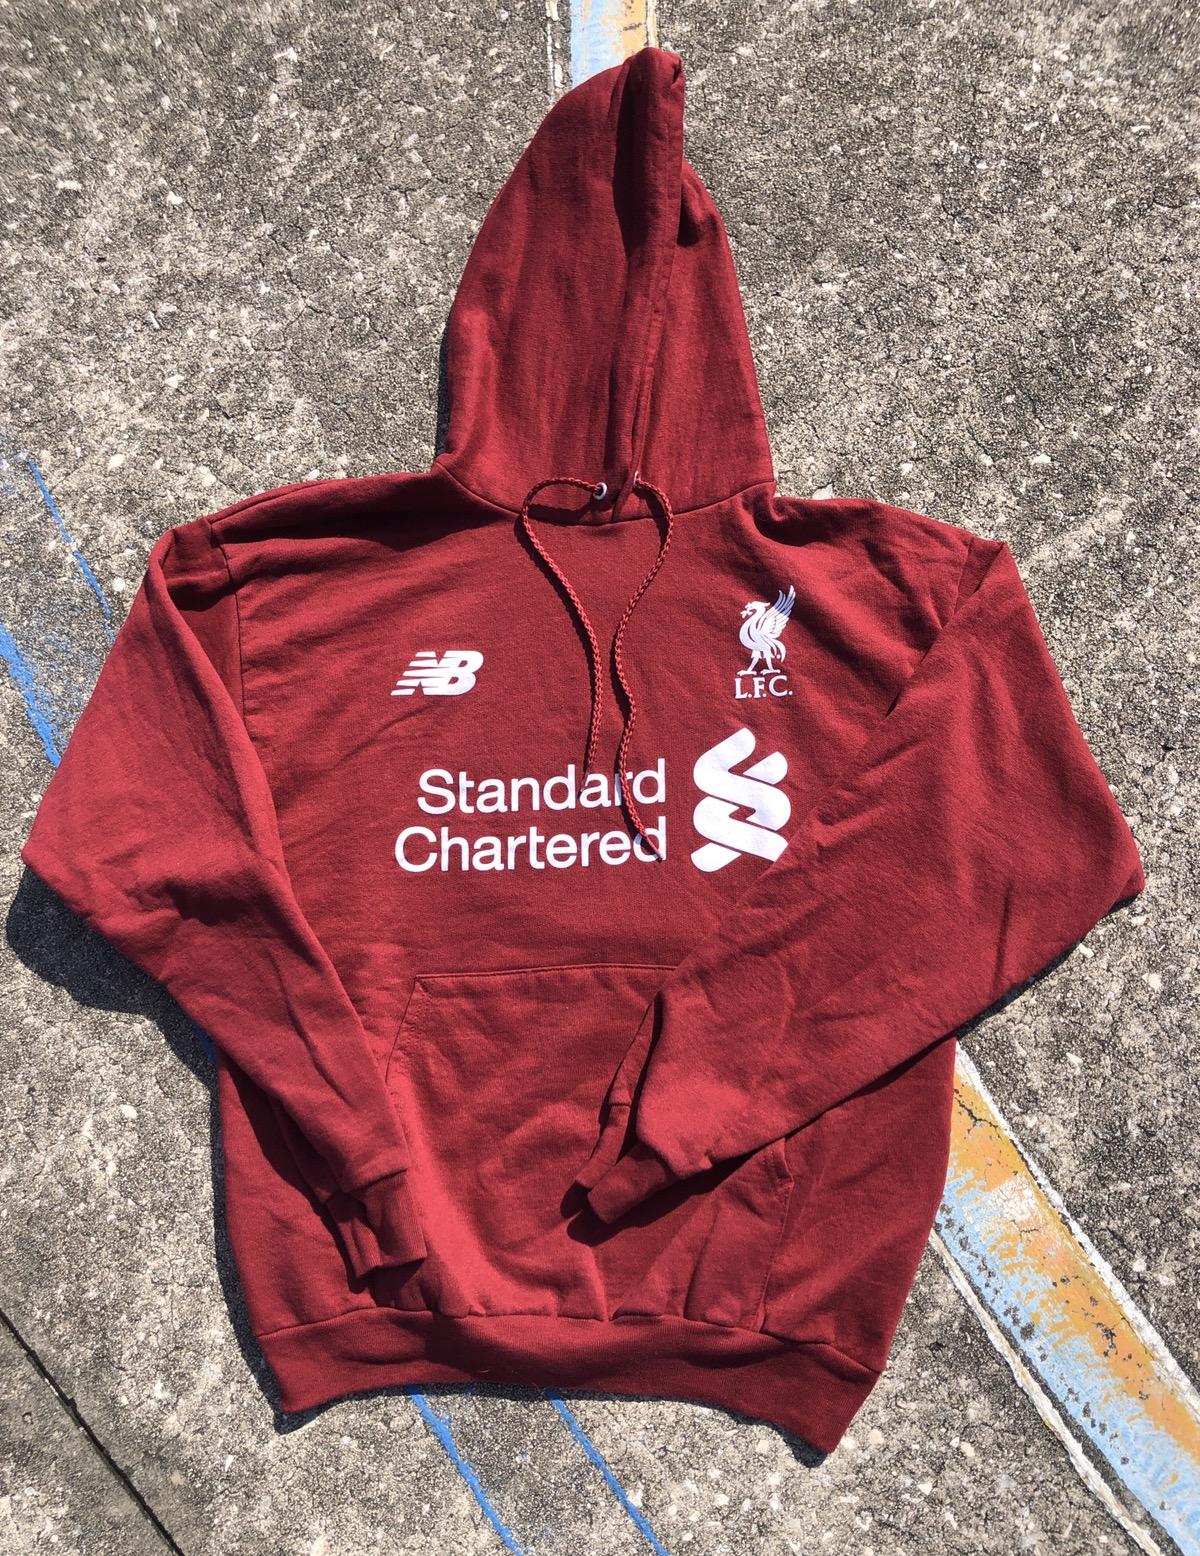 New Balance Liverpool Fc Soccer Jersey Hoodie Sweatshirt Lfc New Balance Grailed